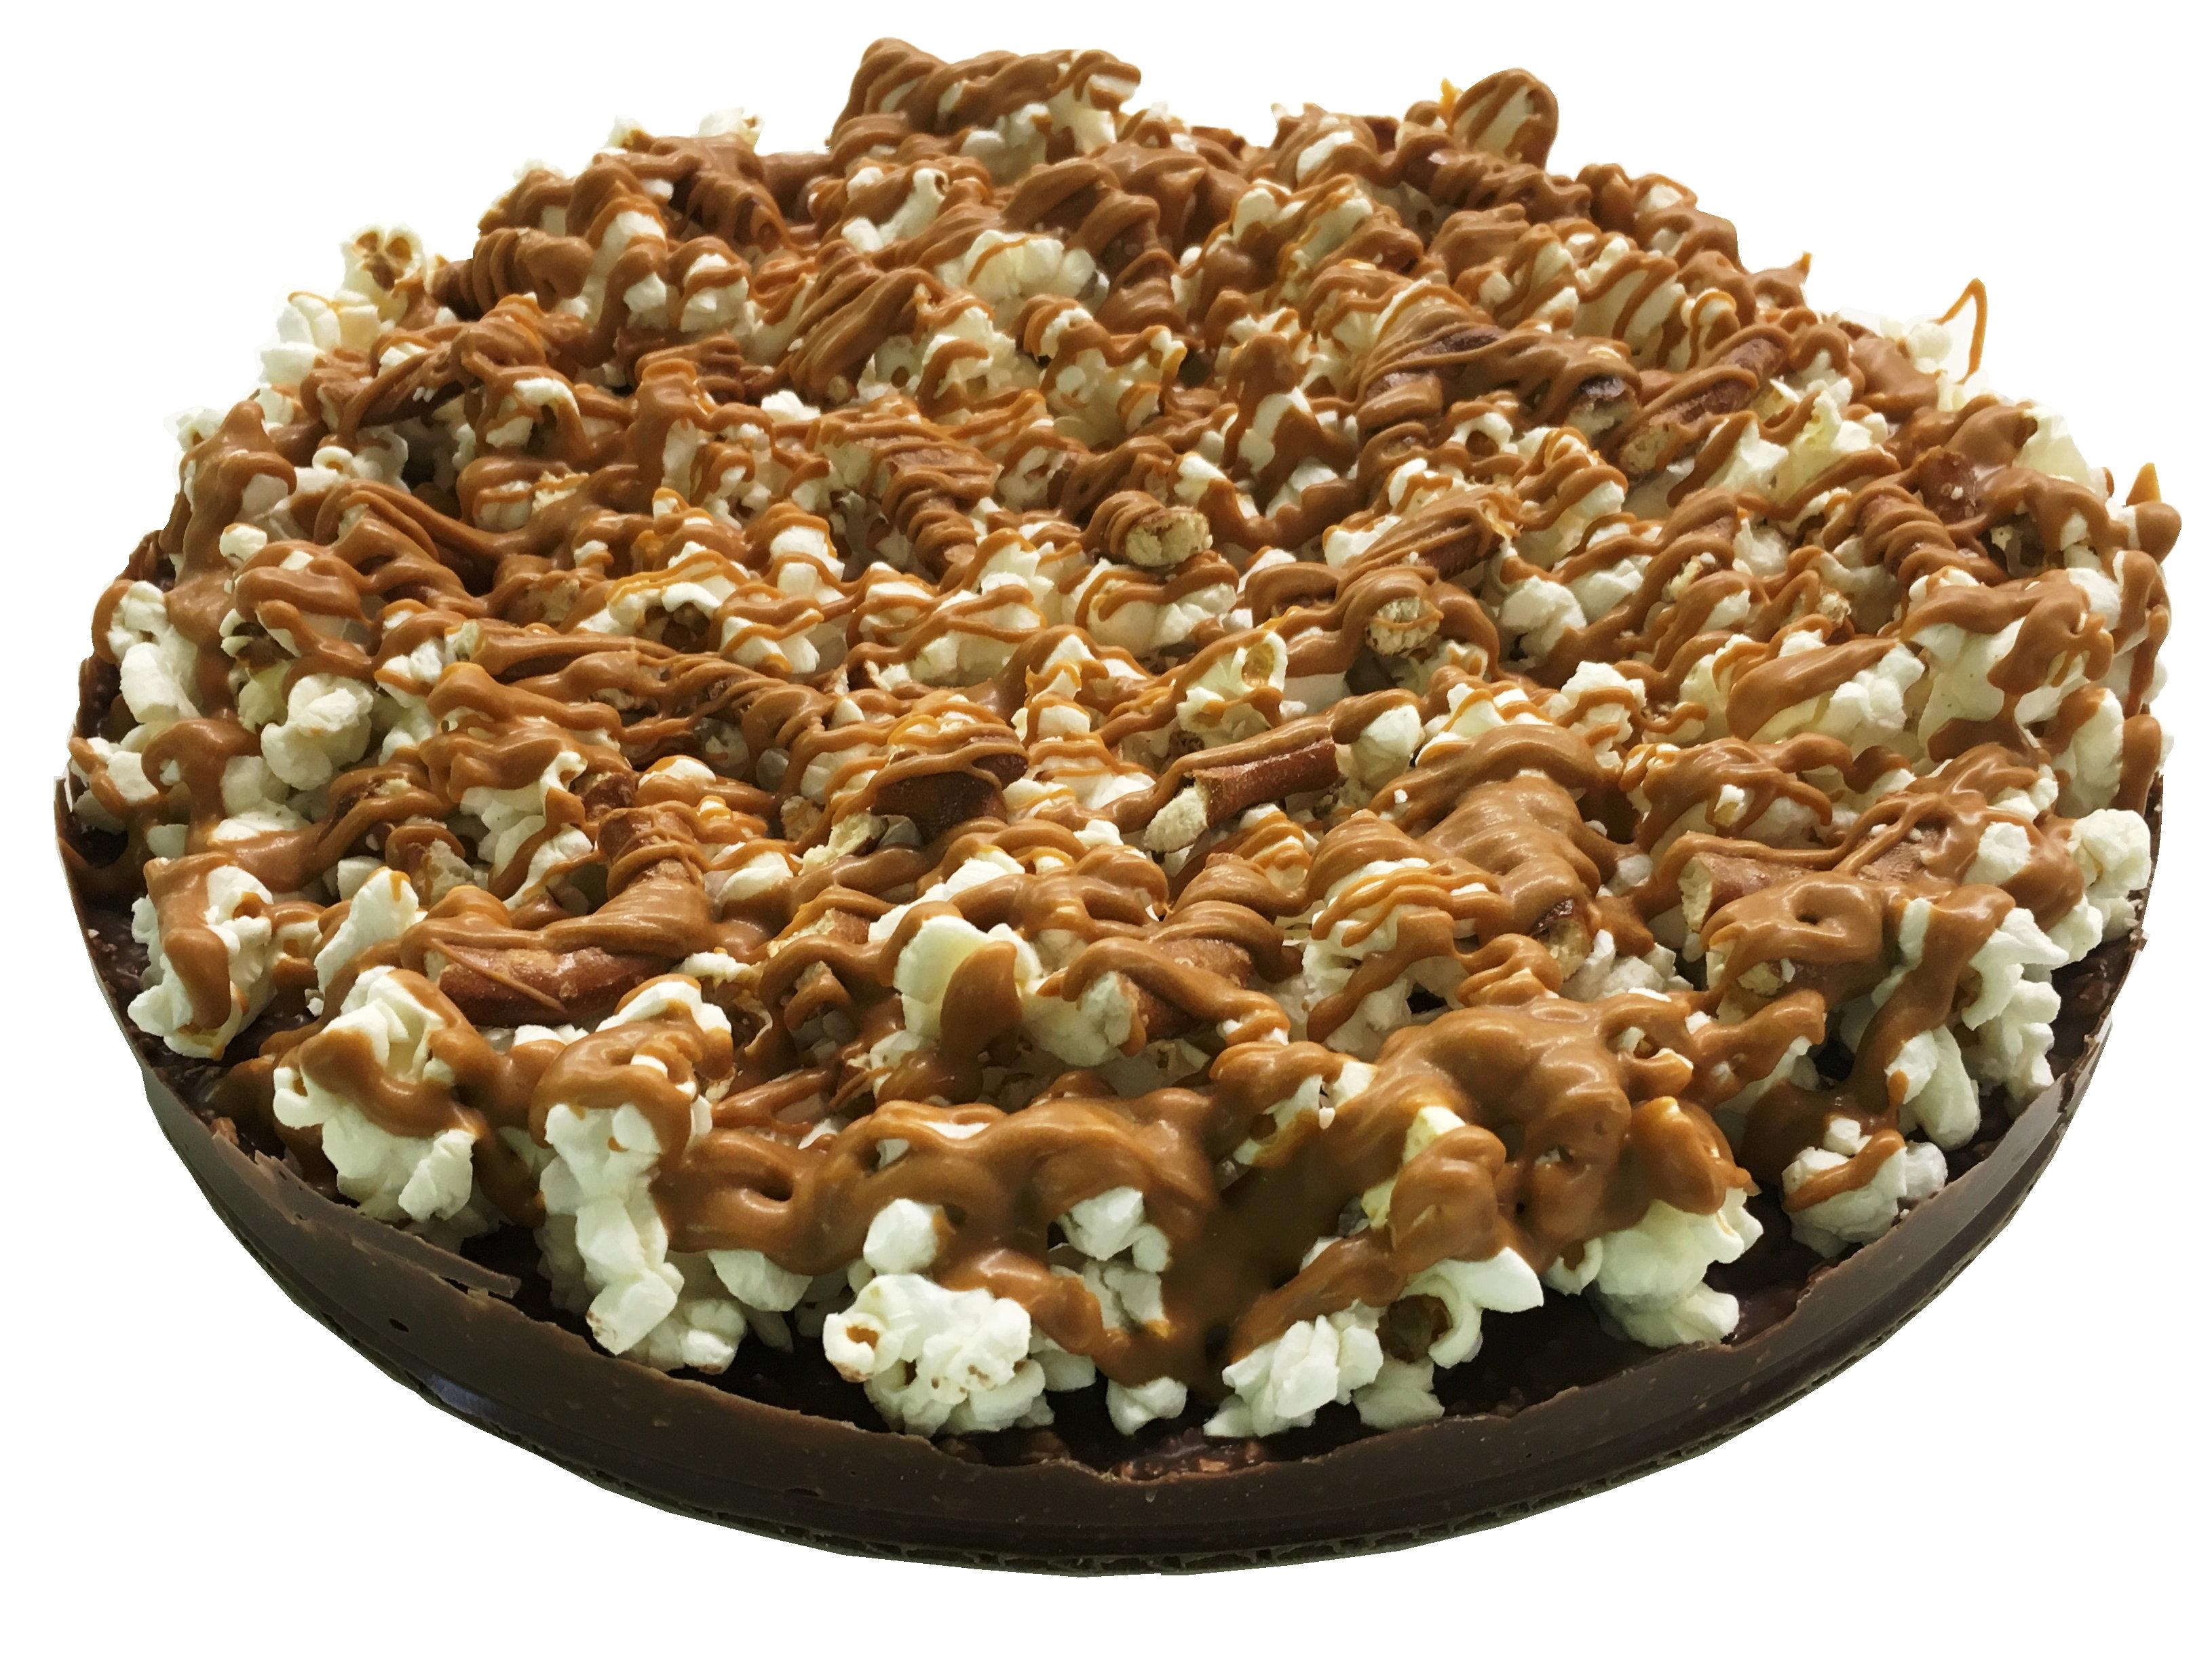 Gourmet Chocolate Pizza - Pizazz™ - Gluten Free - Supreme - Sea Salt Caramel - Wholesale W-PZGFSUCA